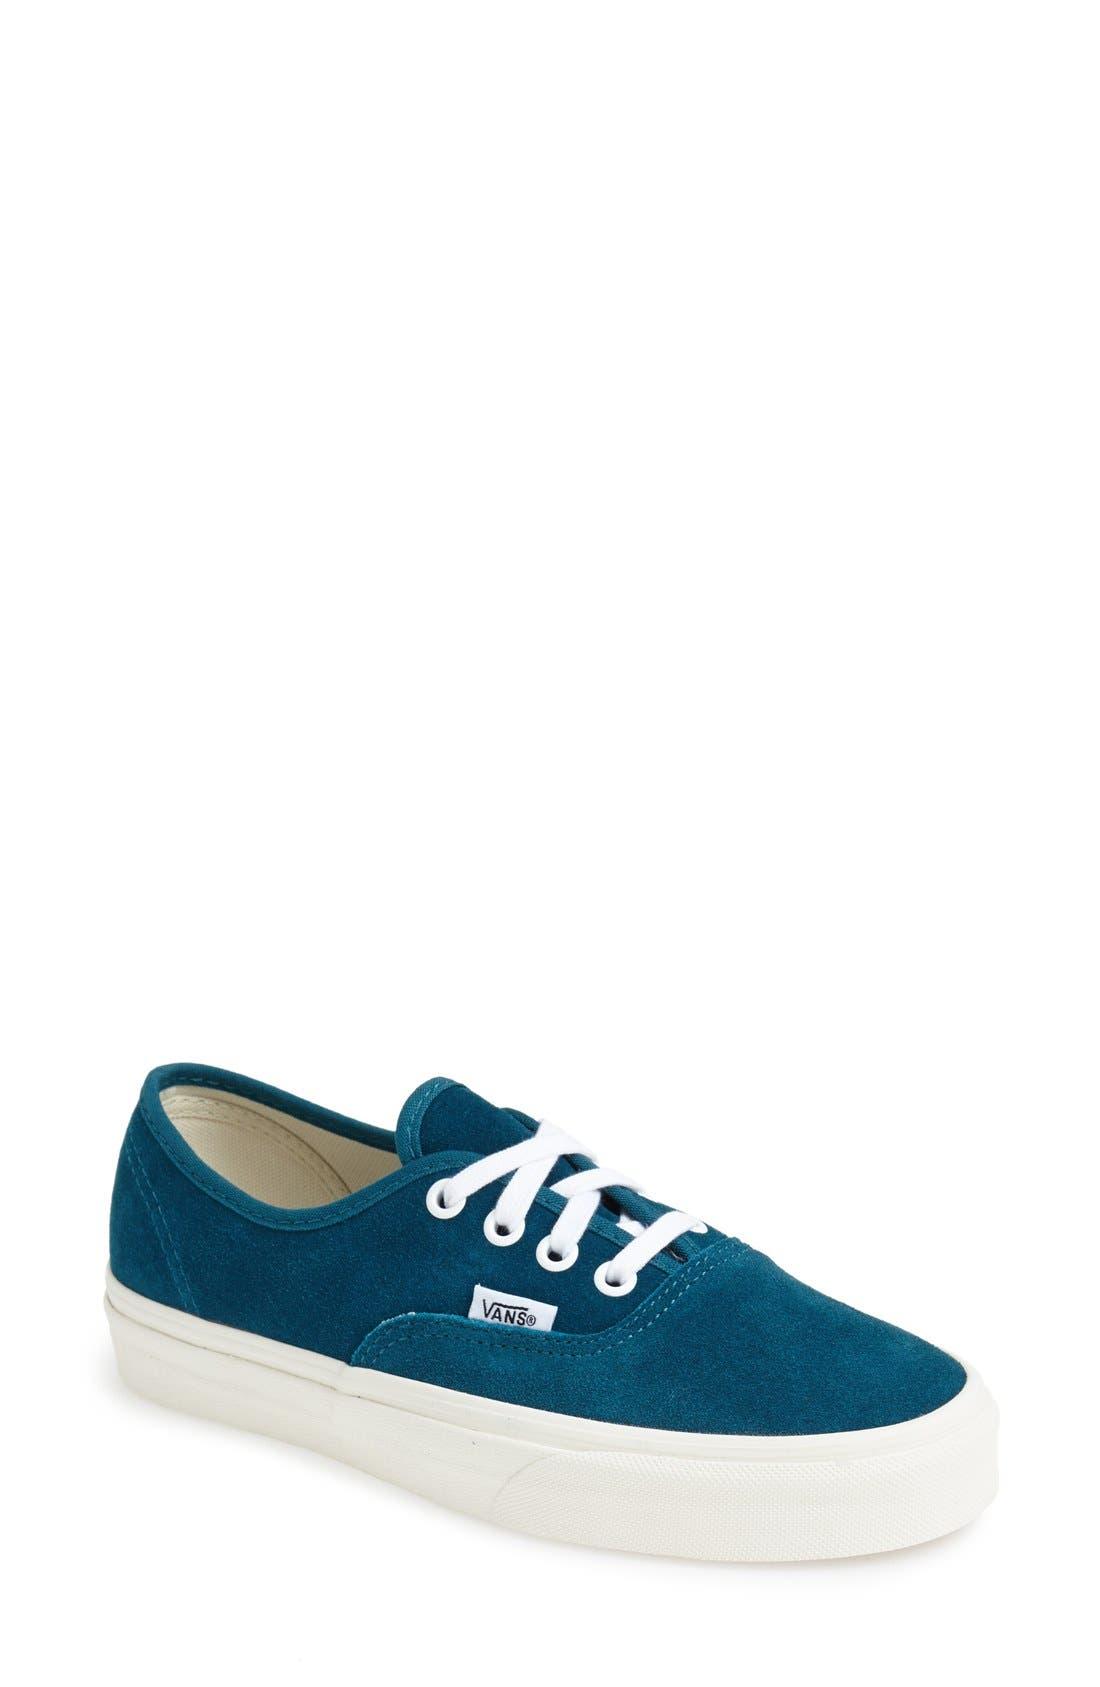 Main Image - Vans 'Vintage Suede Authentic' Sneaker (Women)